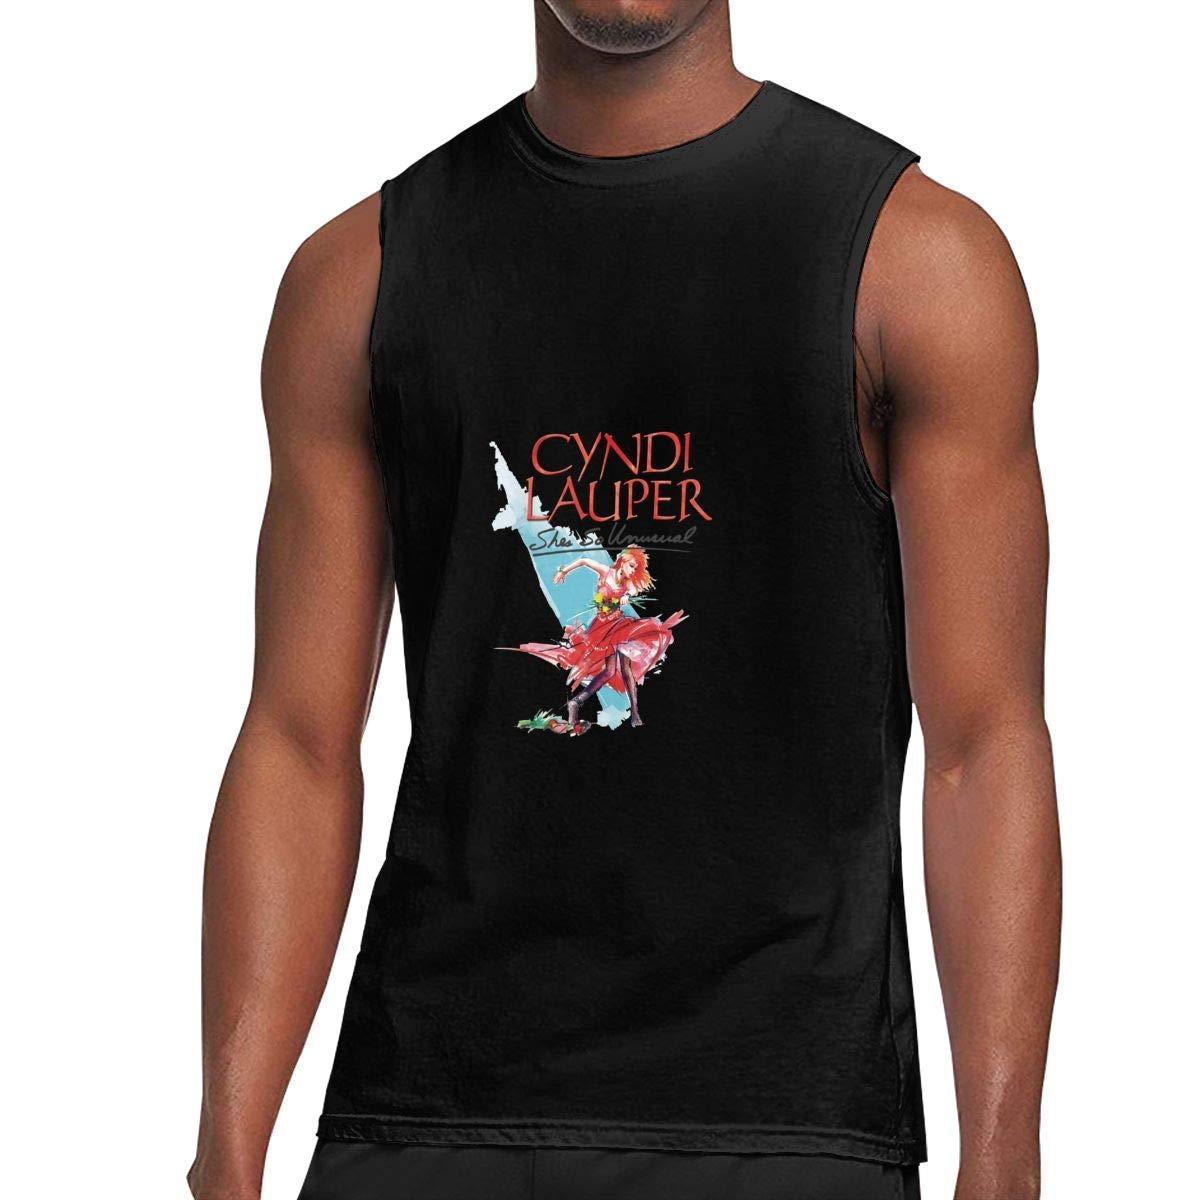 Sleeveless T Shirt Cyndi Lauper Workout Tank Tops Gym Bodybuilding Tshirts Black